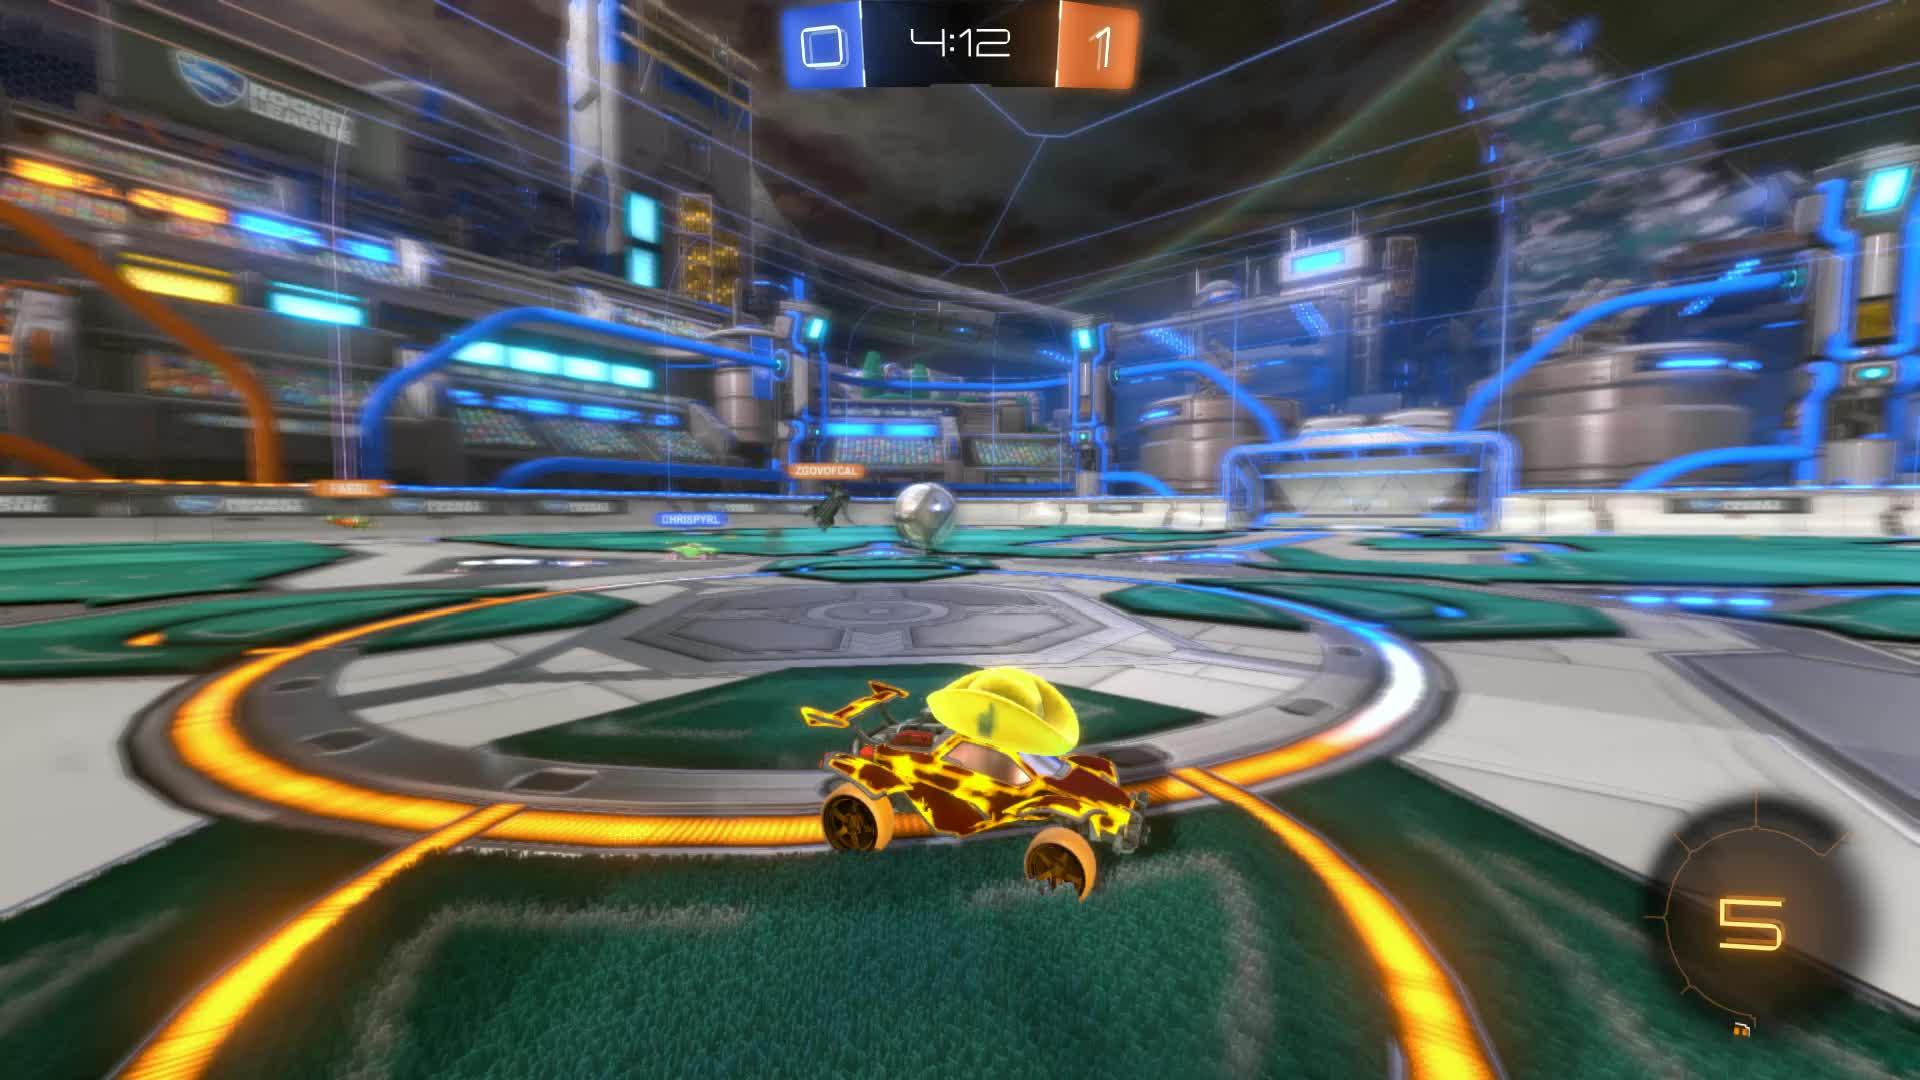 Gif Your Game, GifYourGame, Goal, Reaper, Rocket League, RocketLeague, Goal 2: Post Hero GIFs